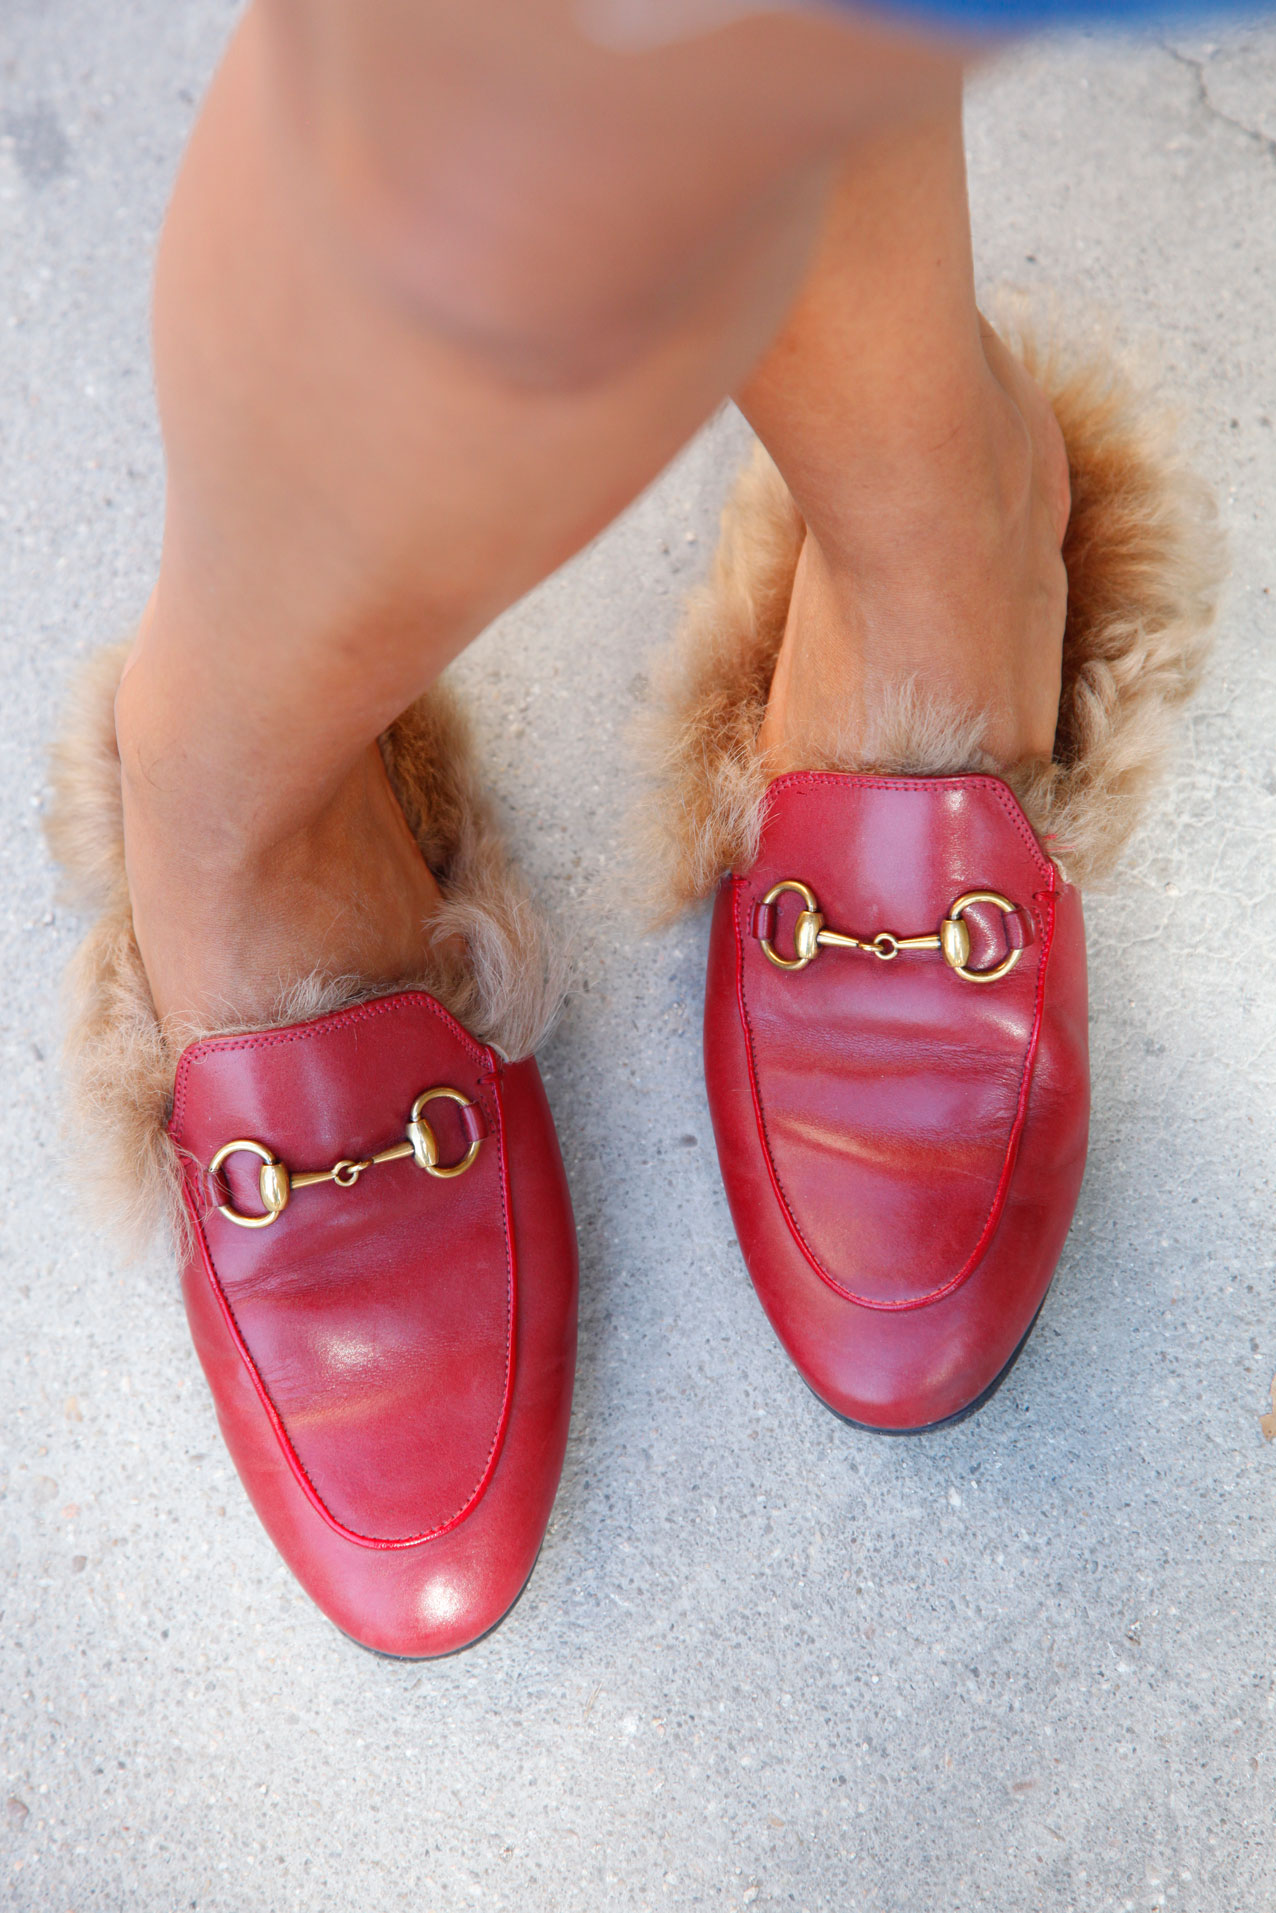 gucci_slippers_adn_denim_skirt_look-cool_lemonade